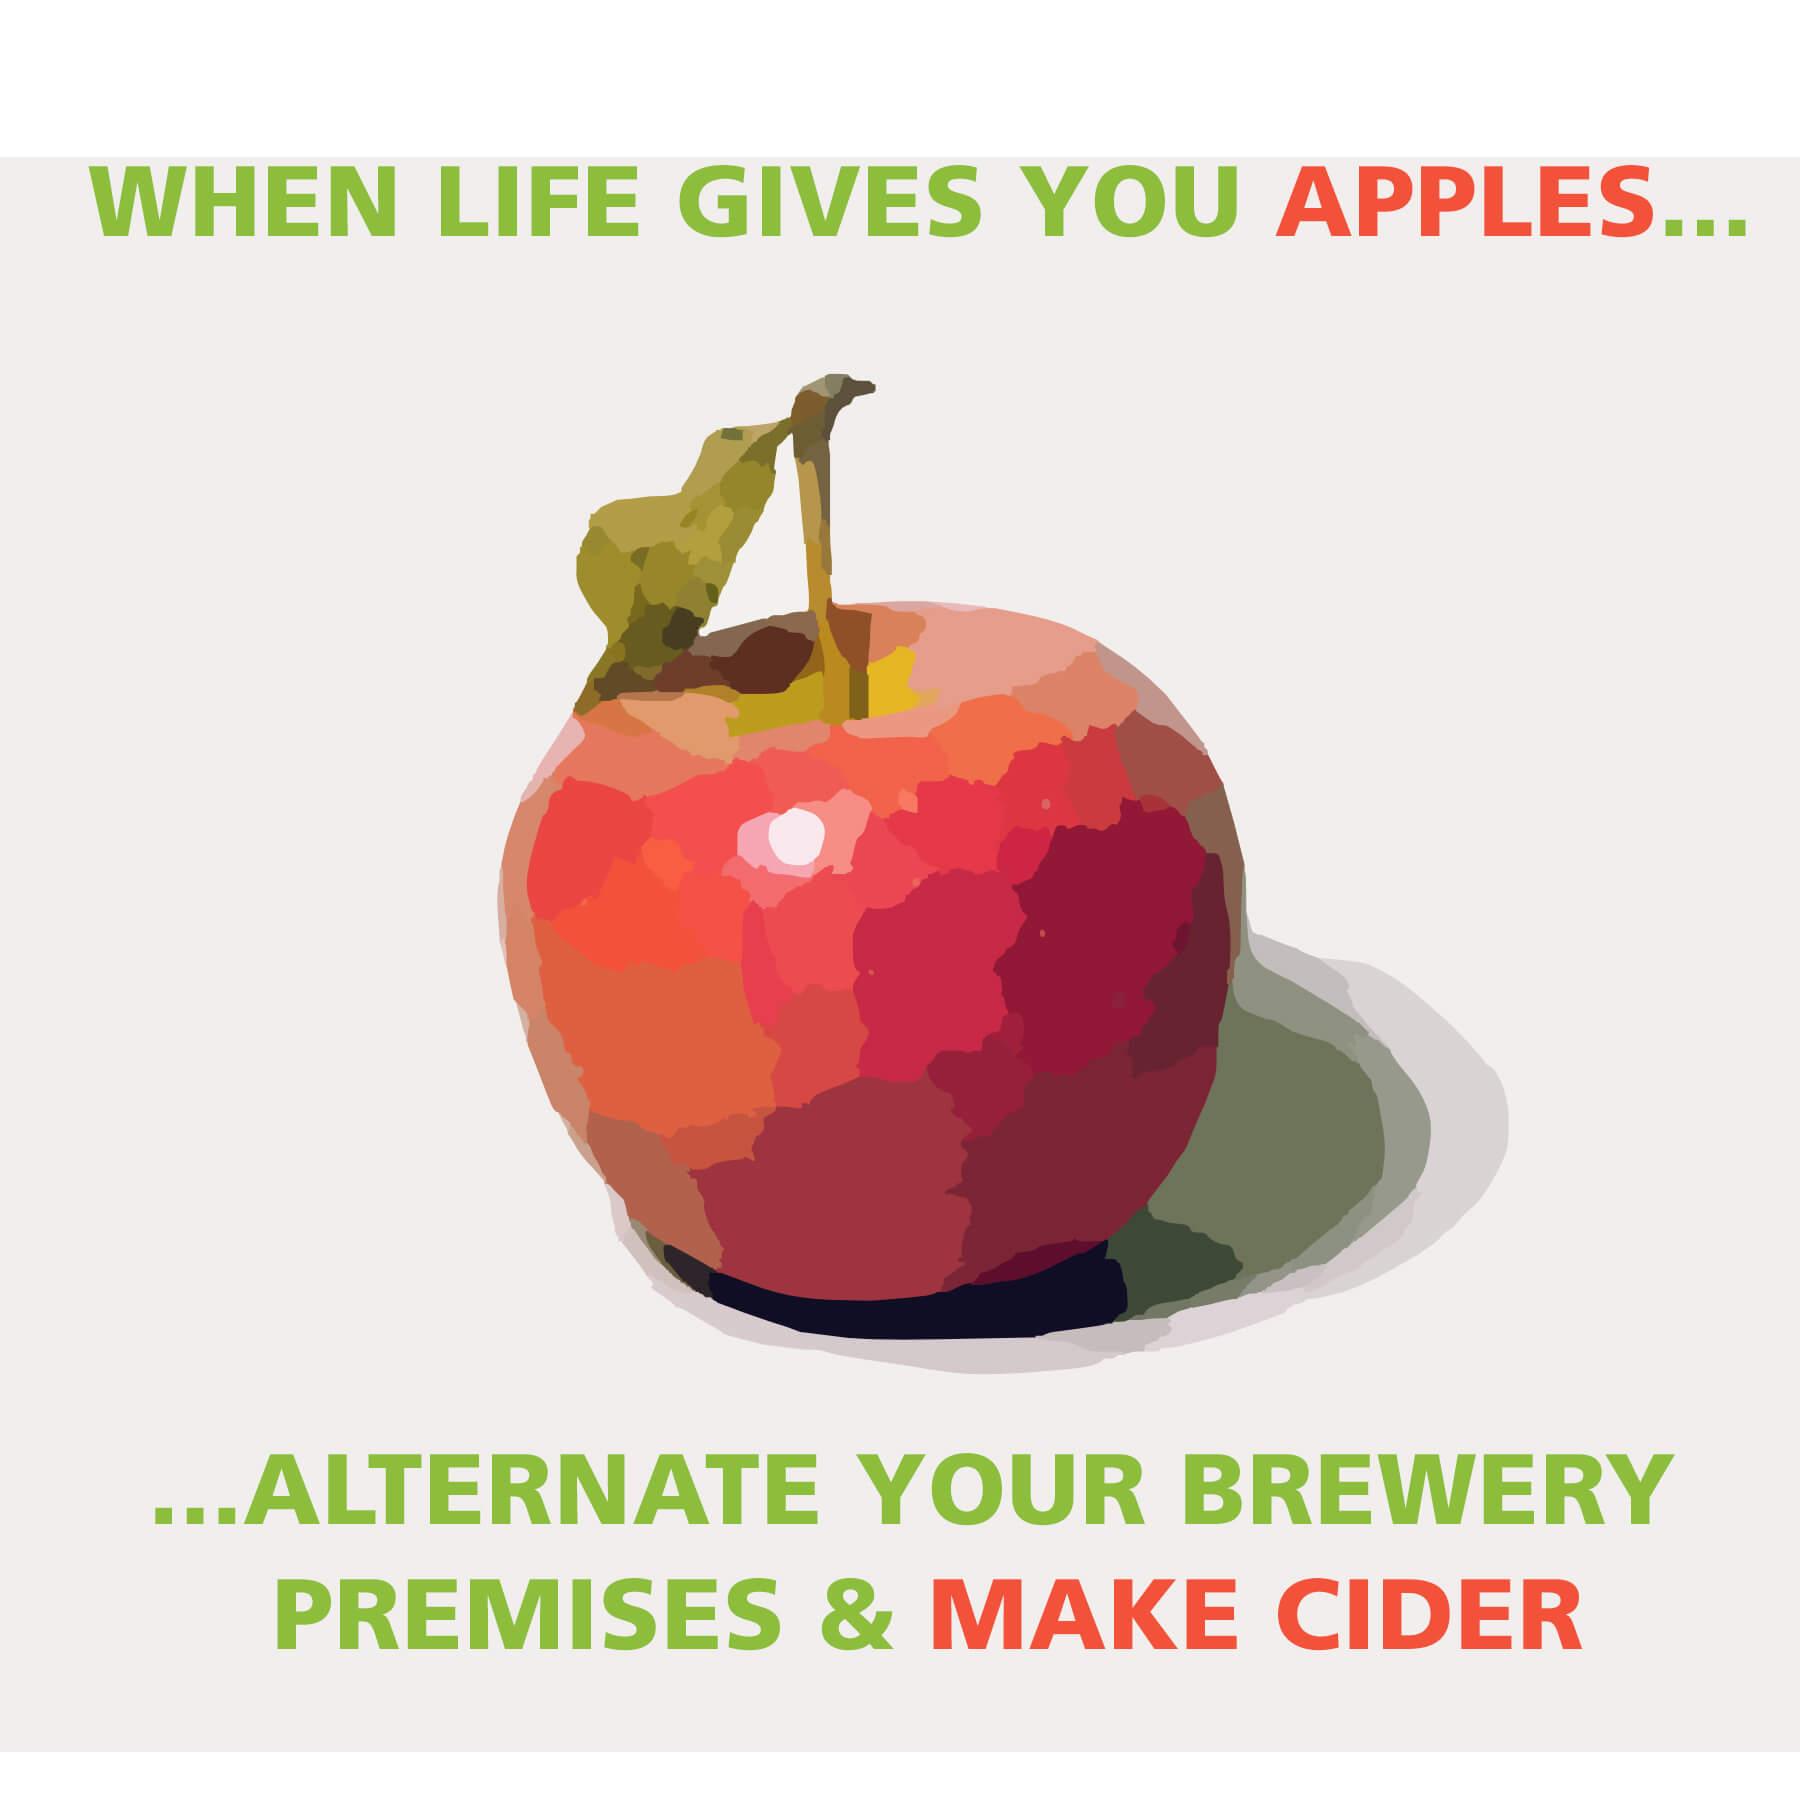 life gives apples alternate your brewery premises make cider